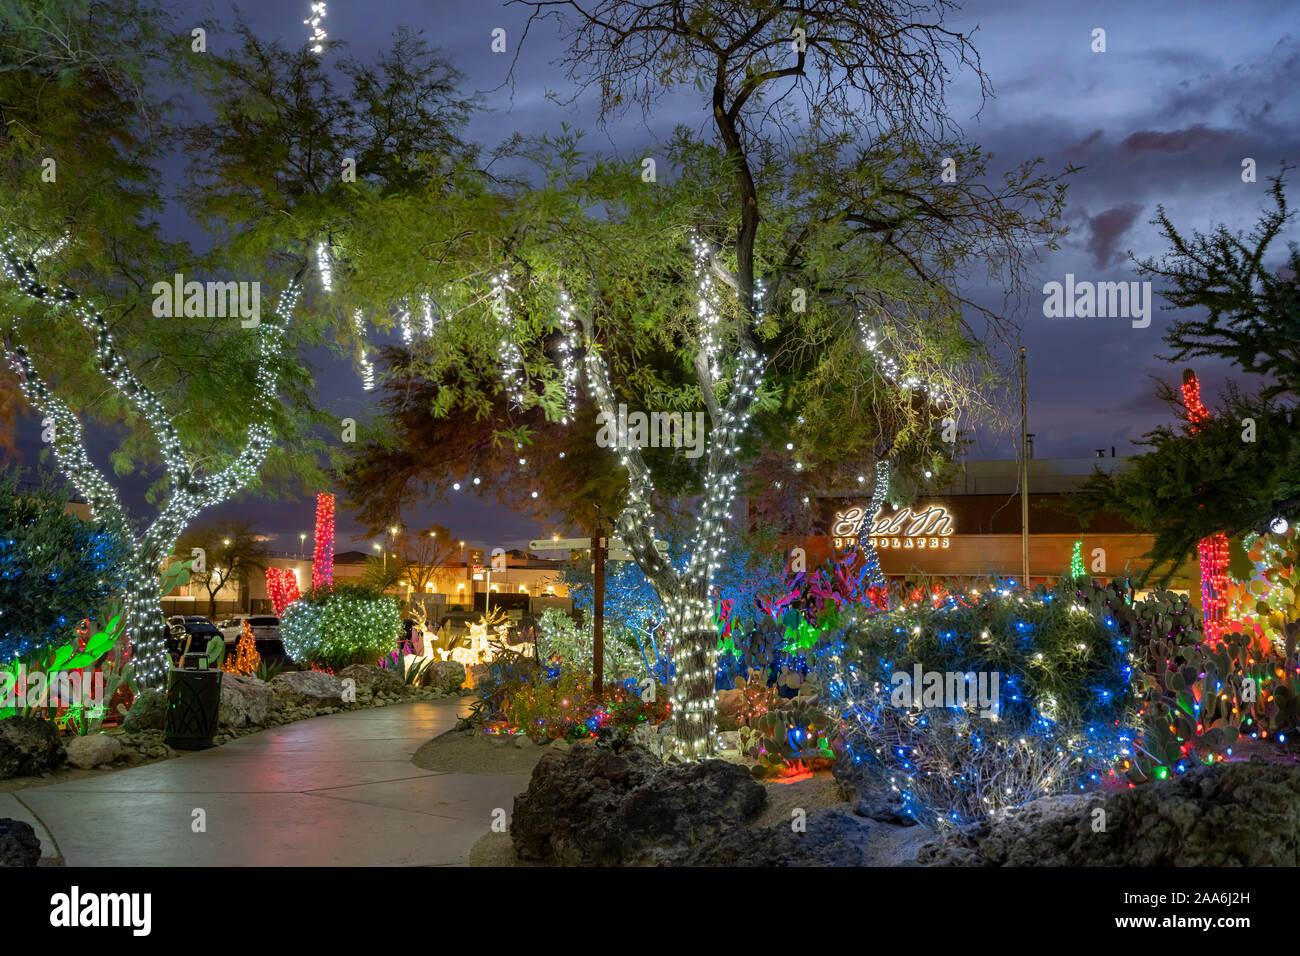 Ethel M Christmas Lights 2021 Henderson Nov 19 Night View Of Many Christmas Lights Of Ethel M Chocolate Factory On Nov 19 2019 At Henderson Nevada Stock Photo Alamy